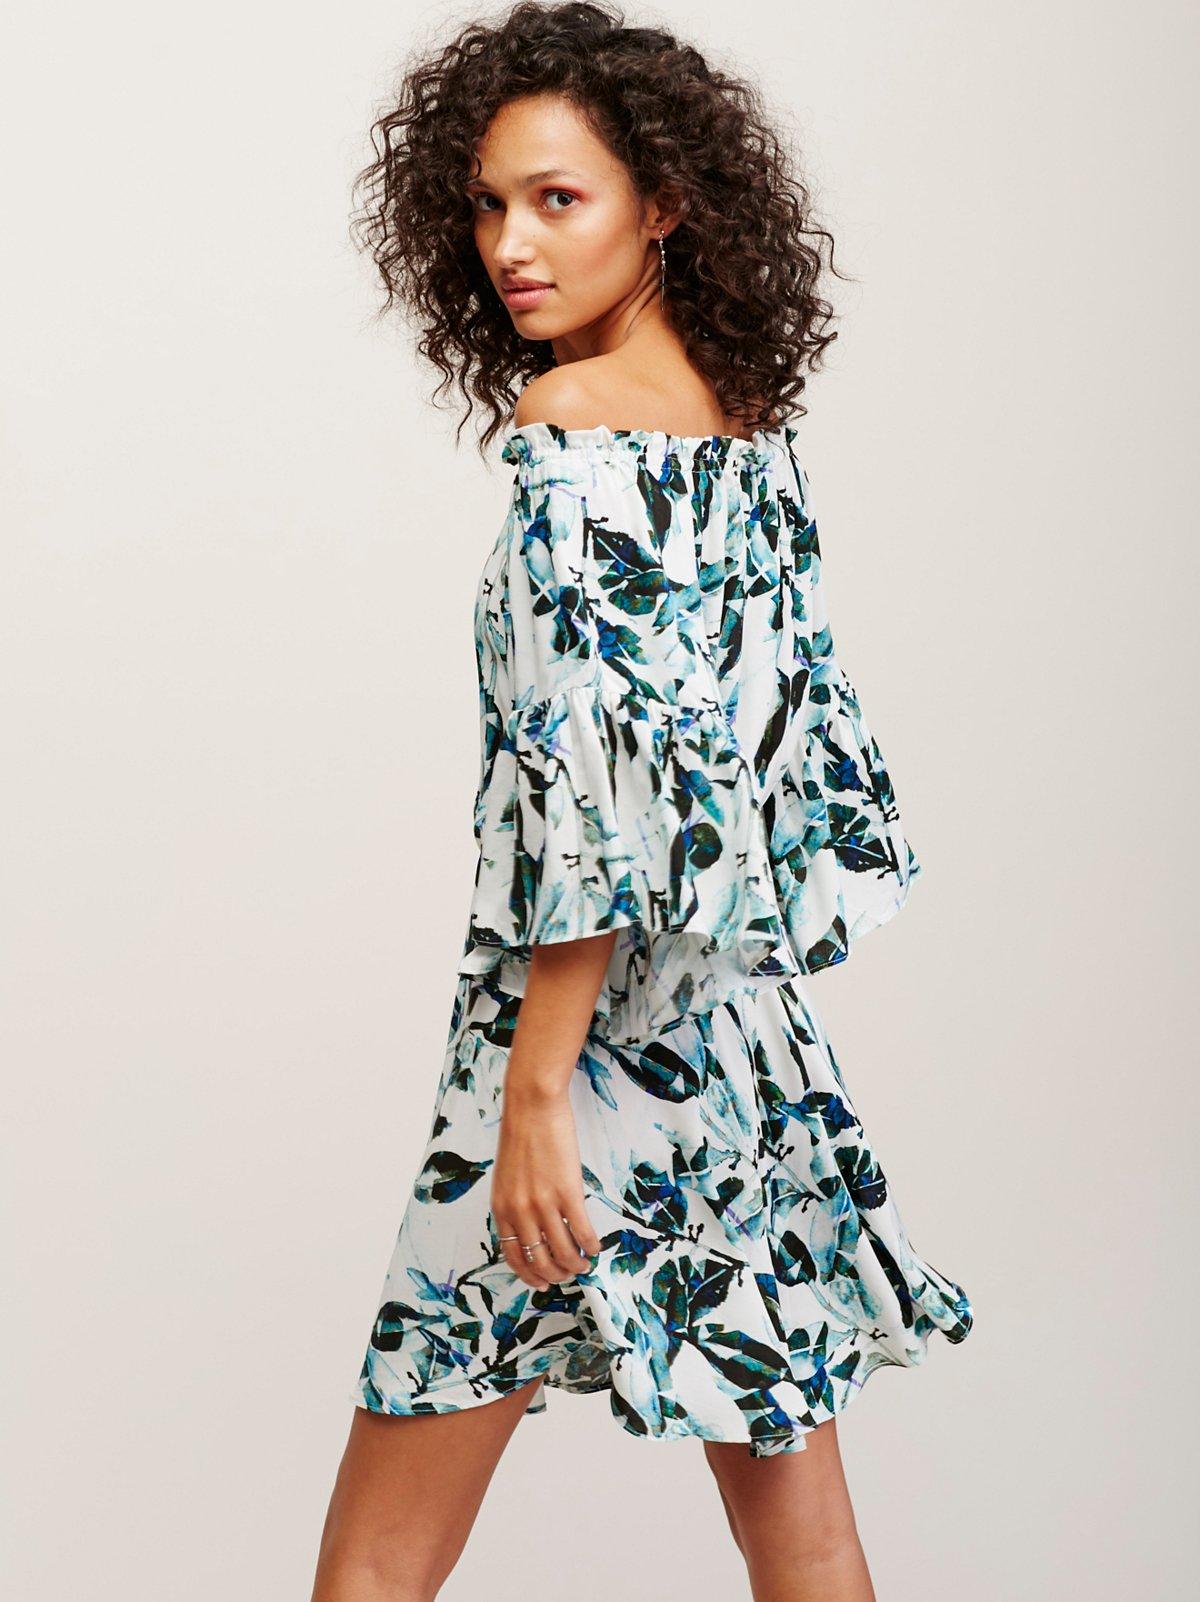 Alexandra连衣裙